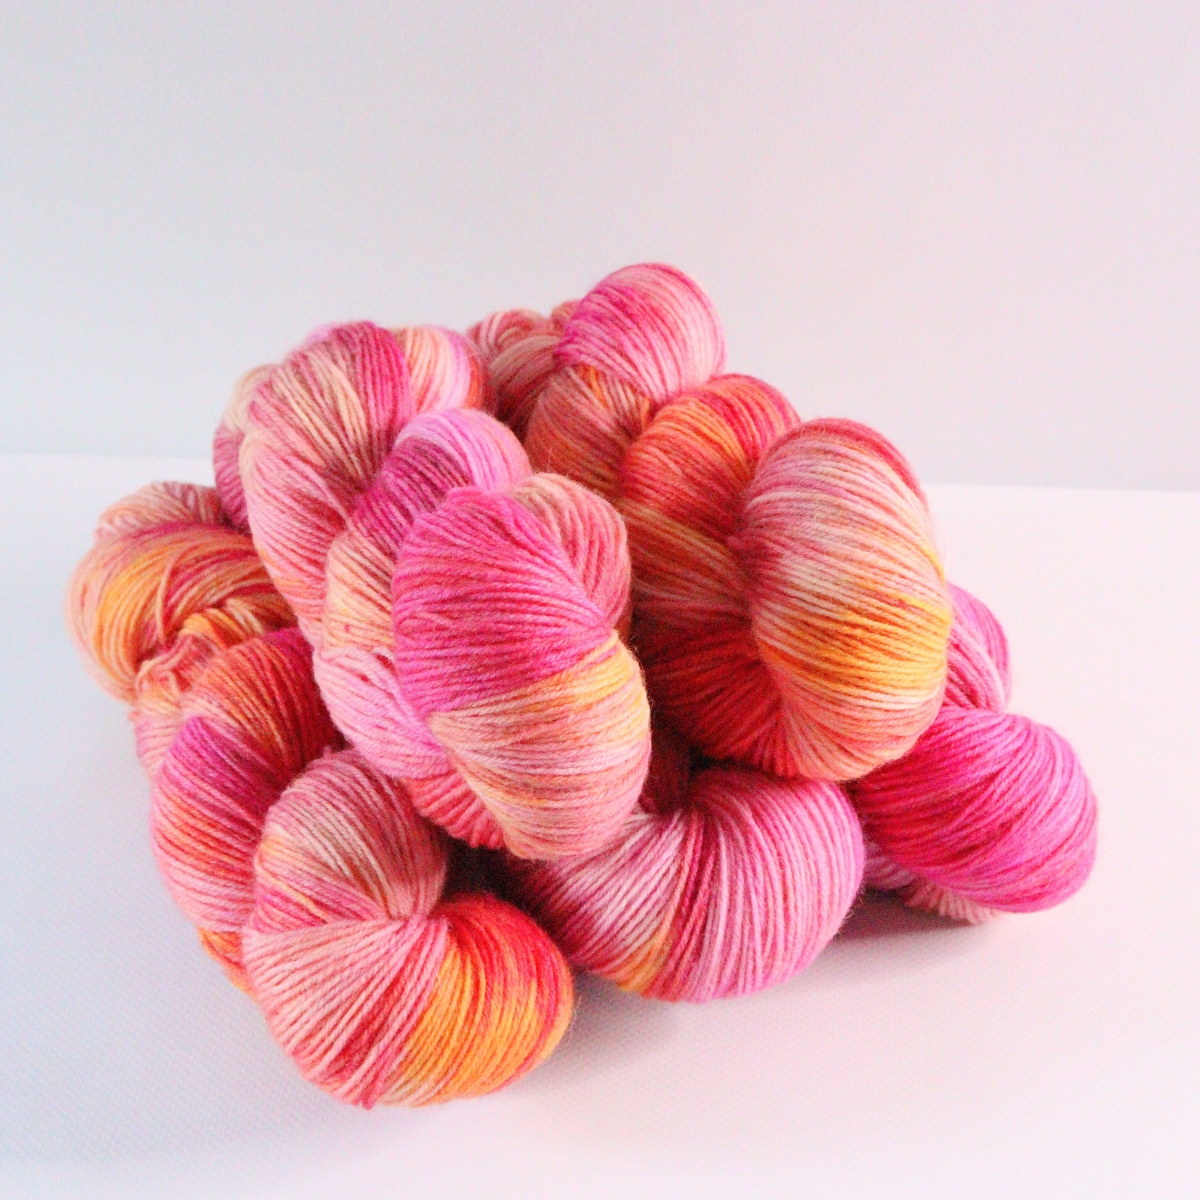 woodico.pro hand dyed yarn 076 2 1200x1200 - Hand dyed yarn / 076